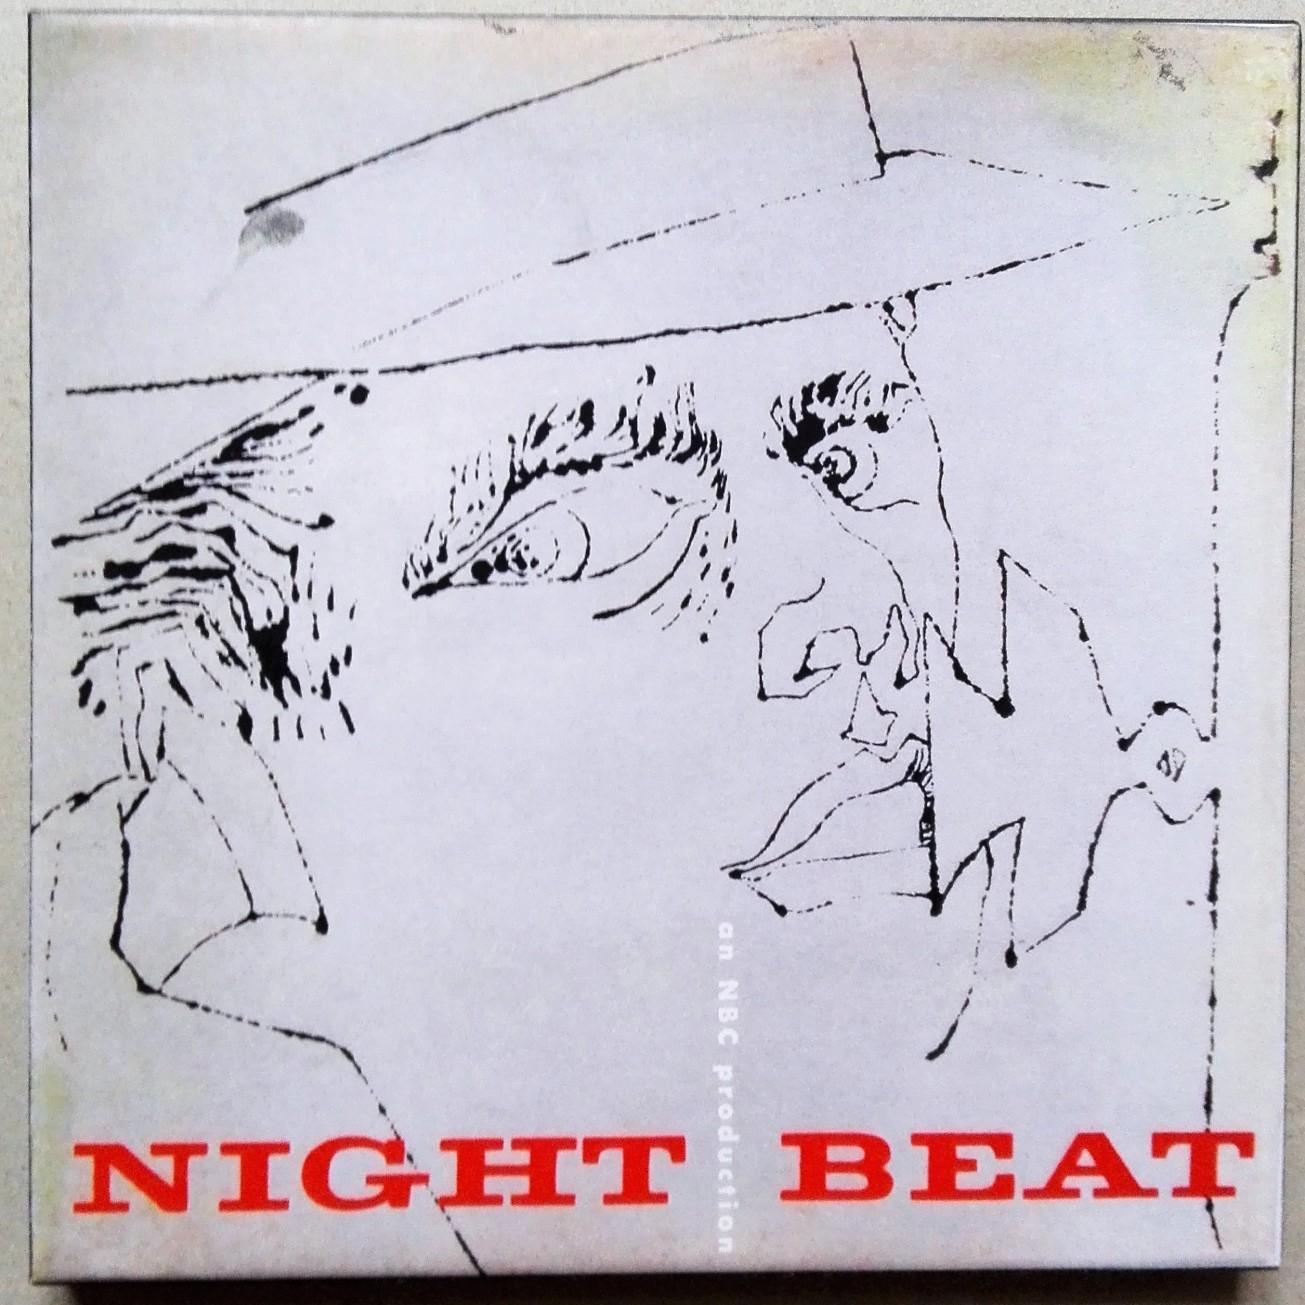 NightBeat 3